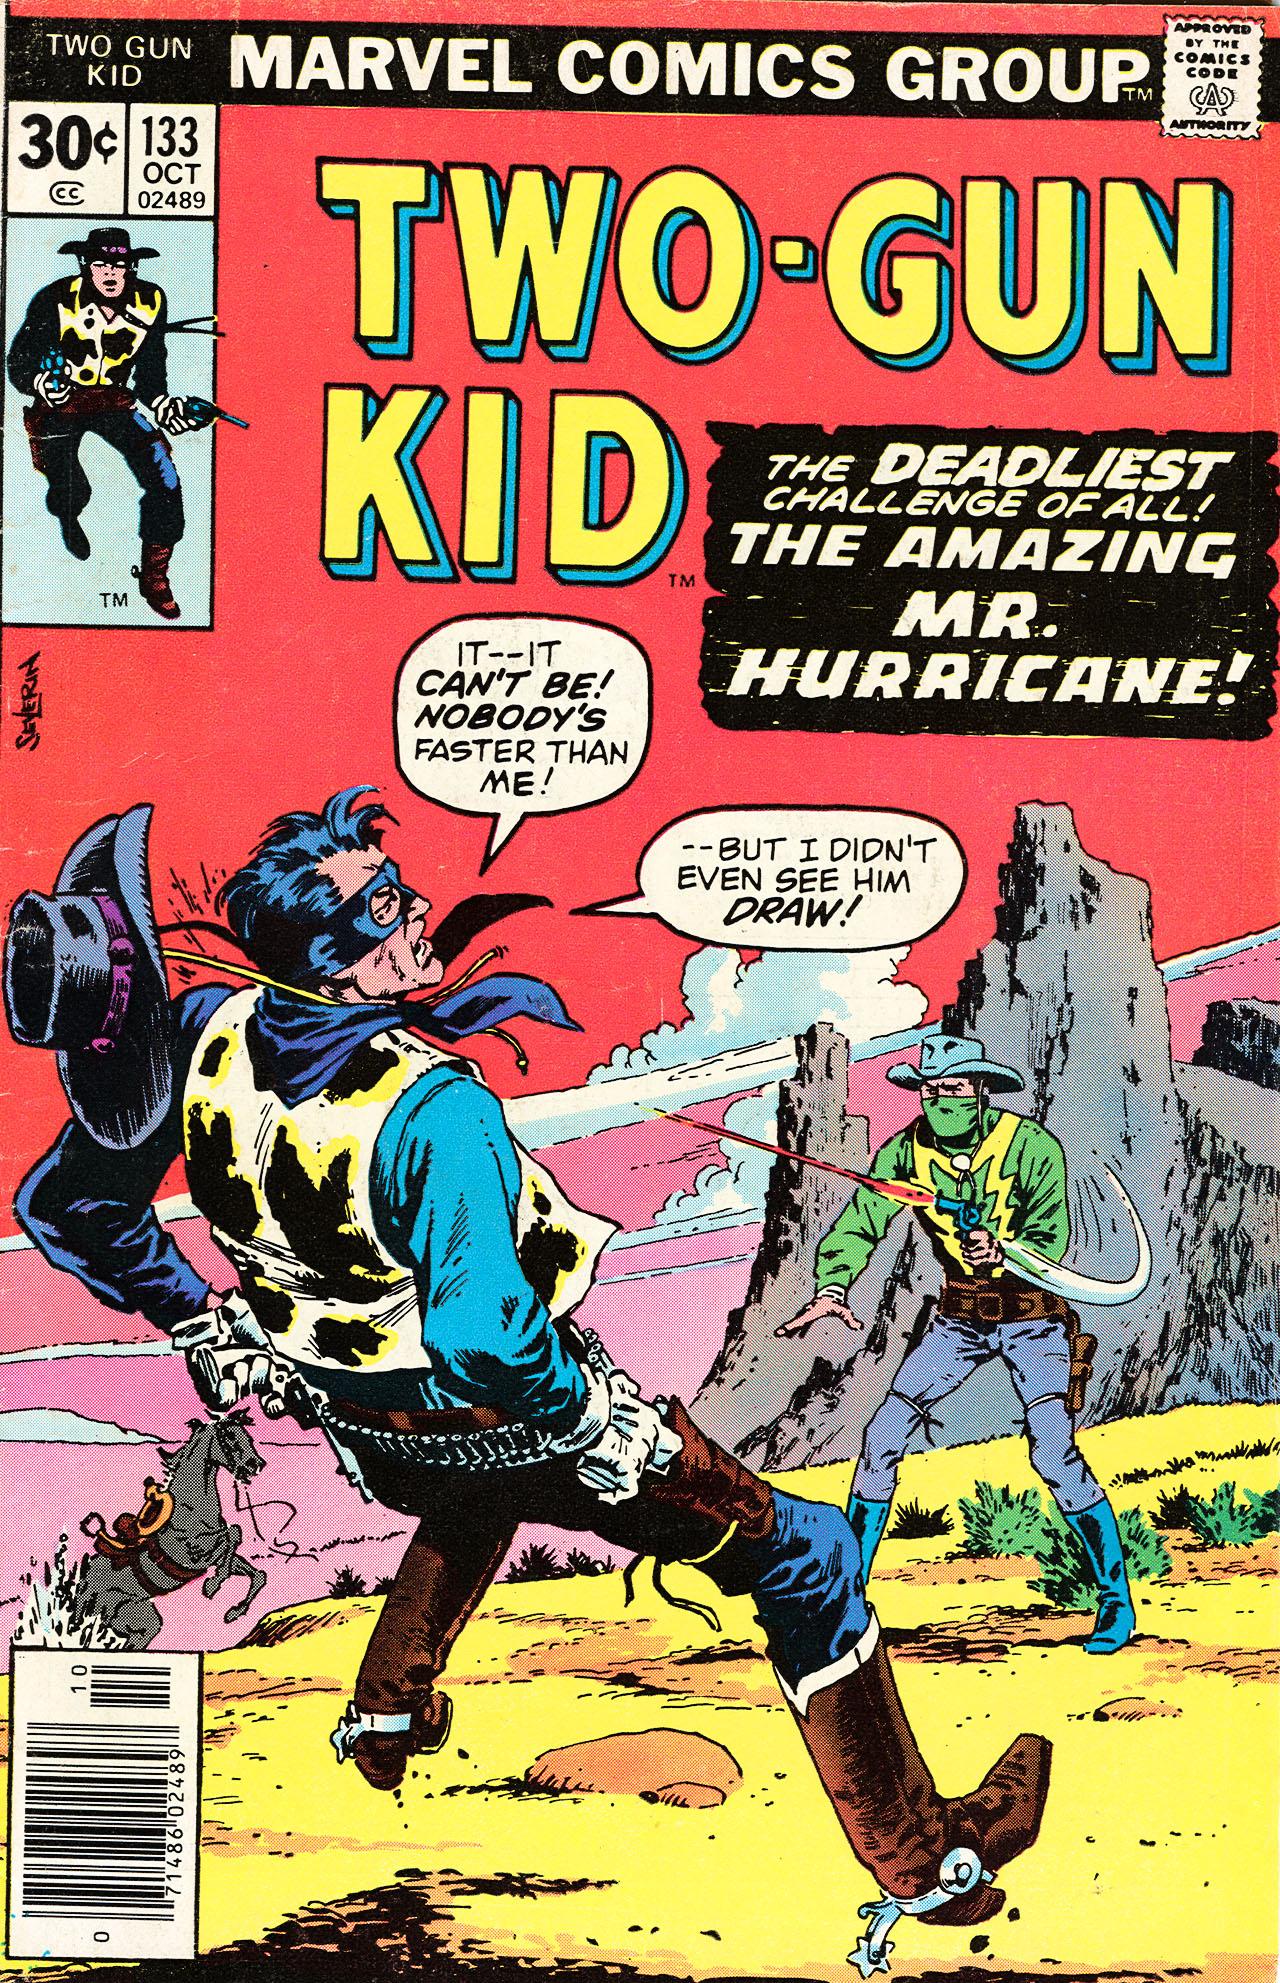 Read online Two-Gun Kid comic -  Issue #133 - 1